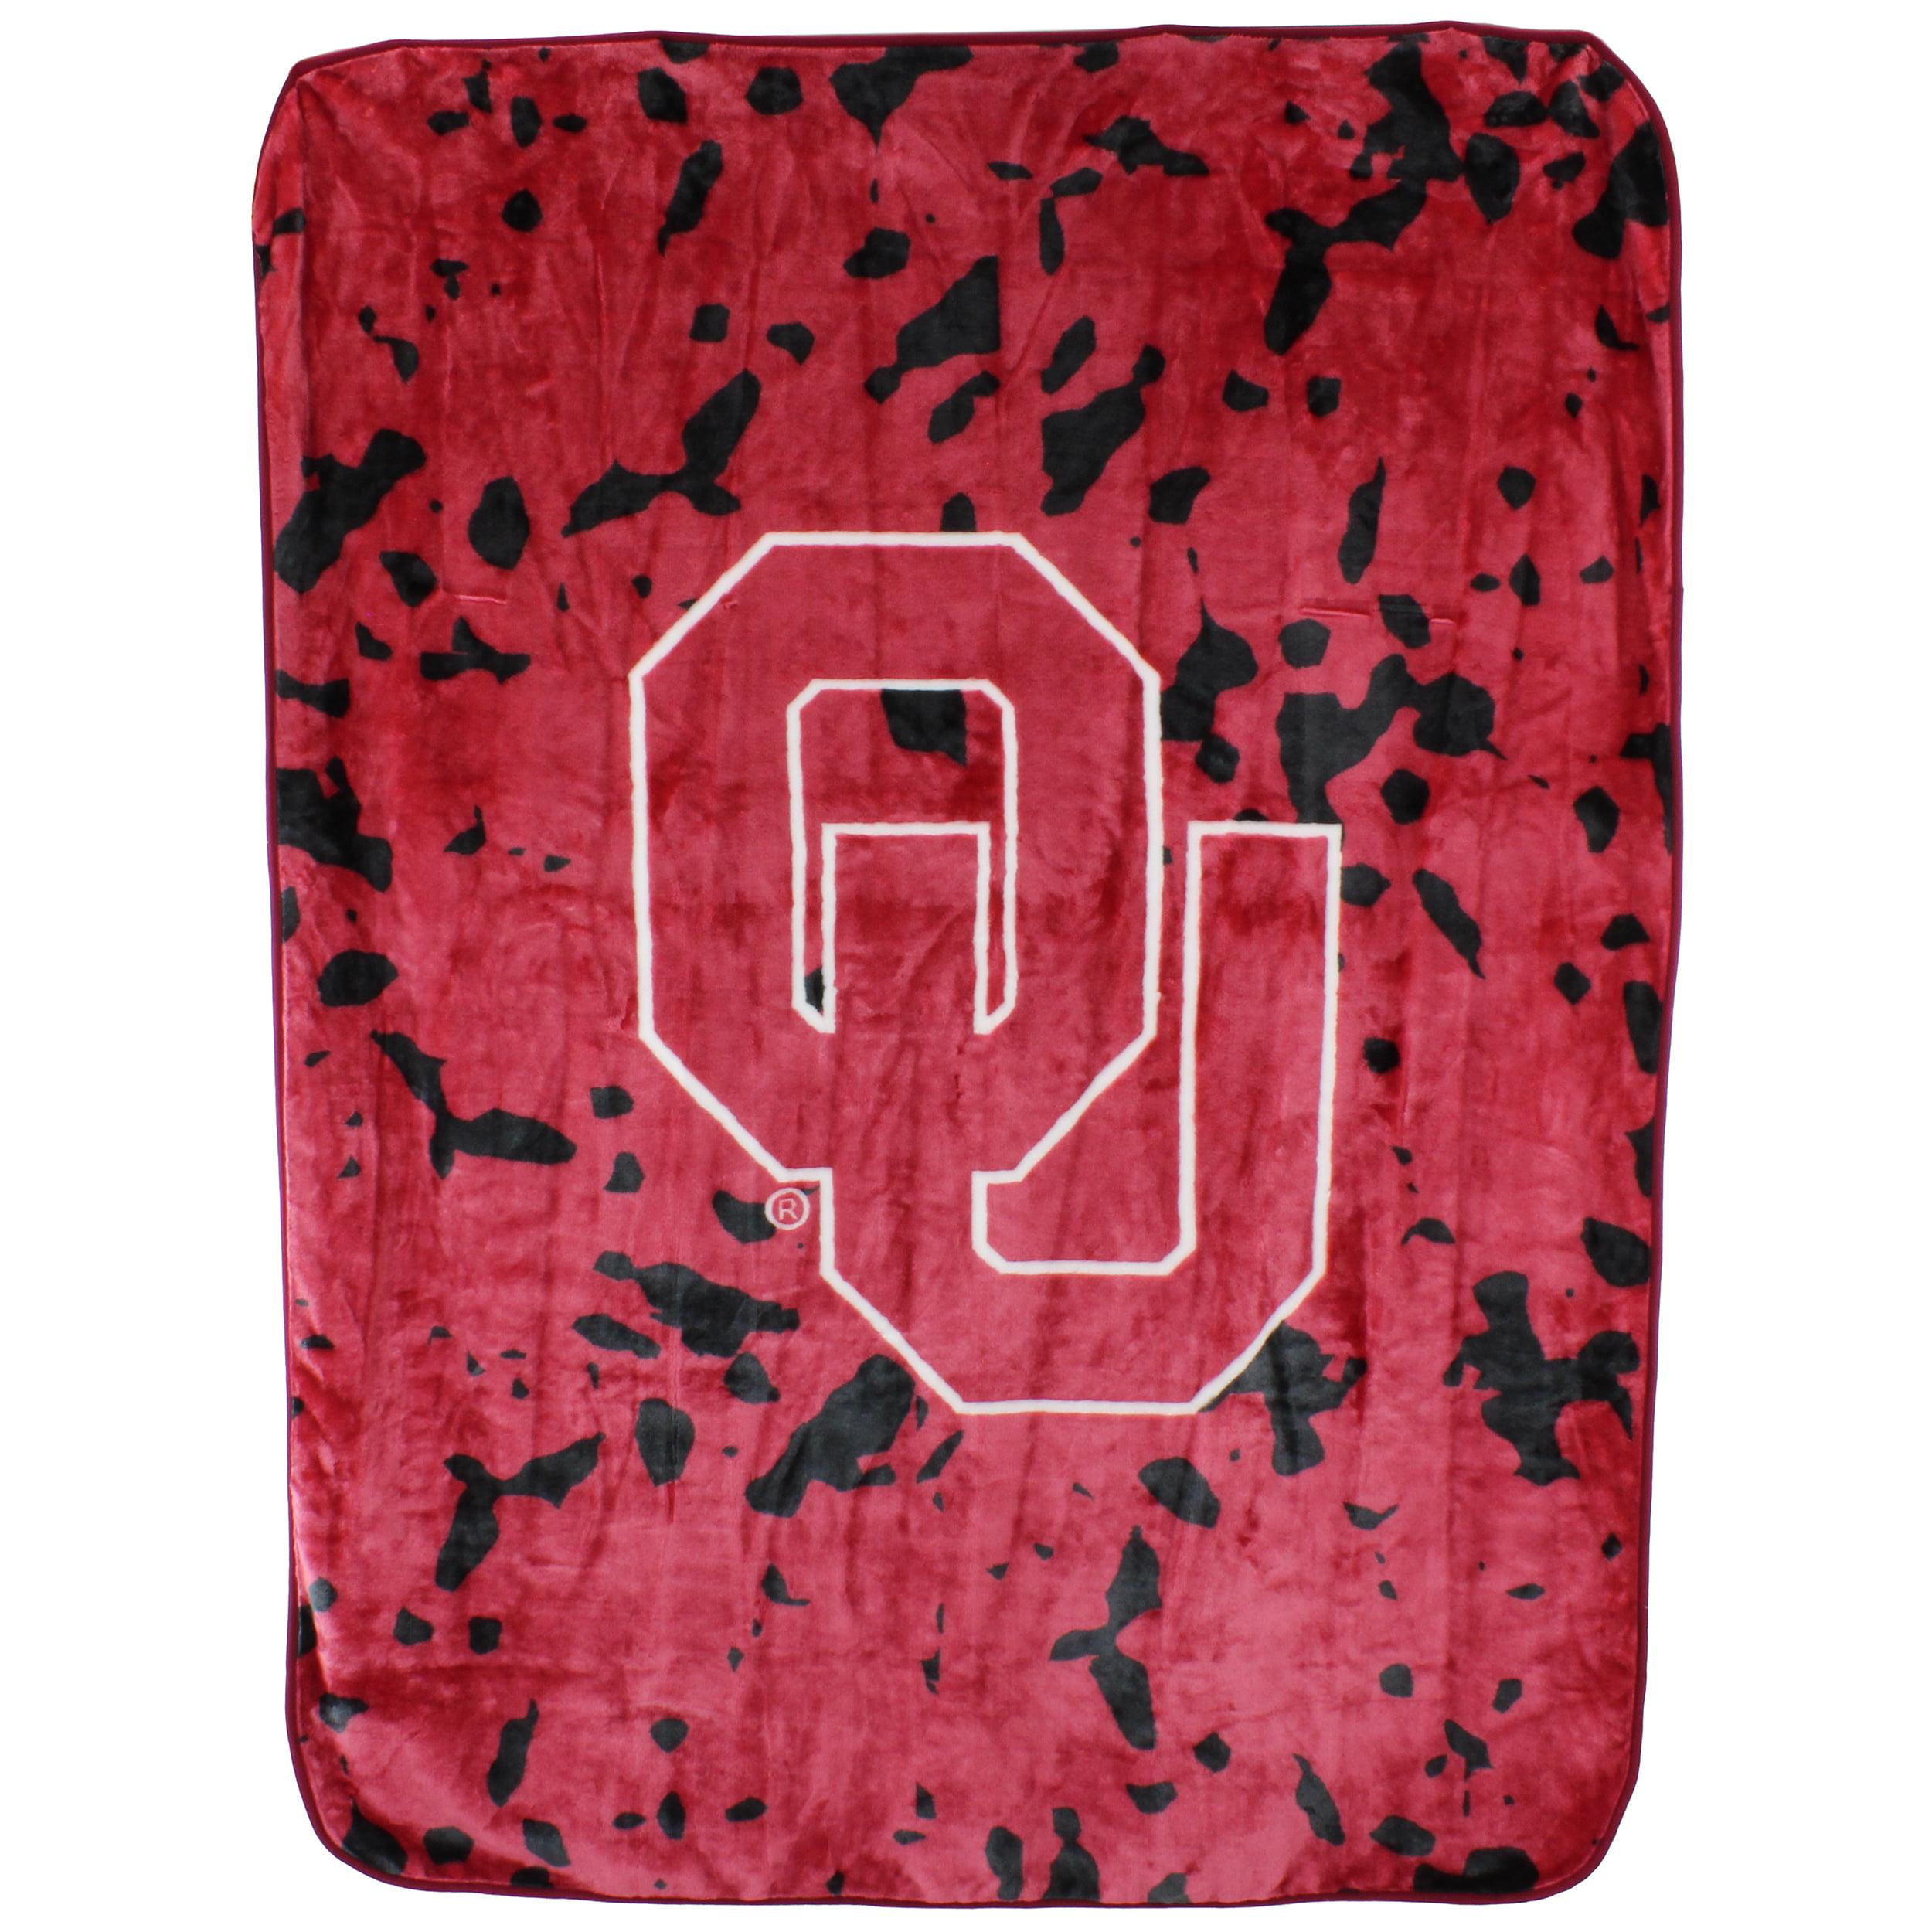 Oklahoma Sooners Blanket Oklahoma Fleece Blanket